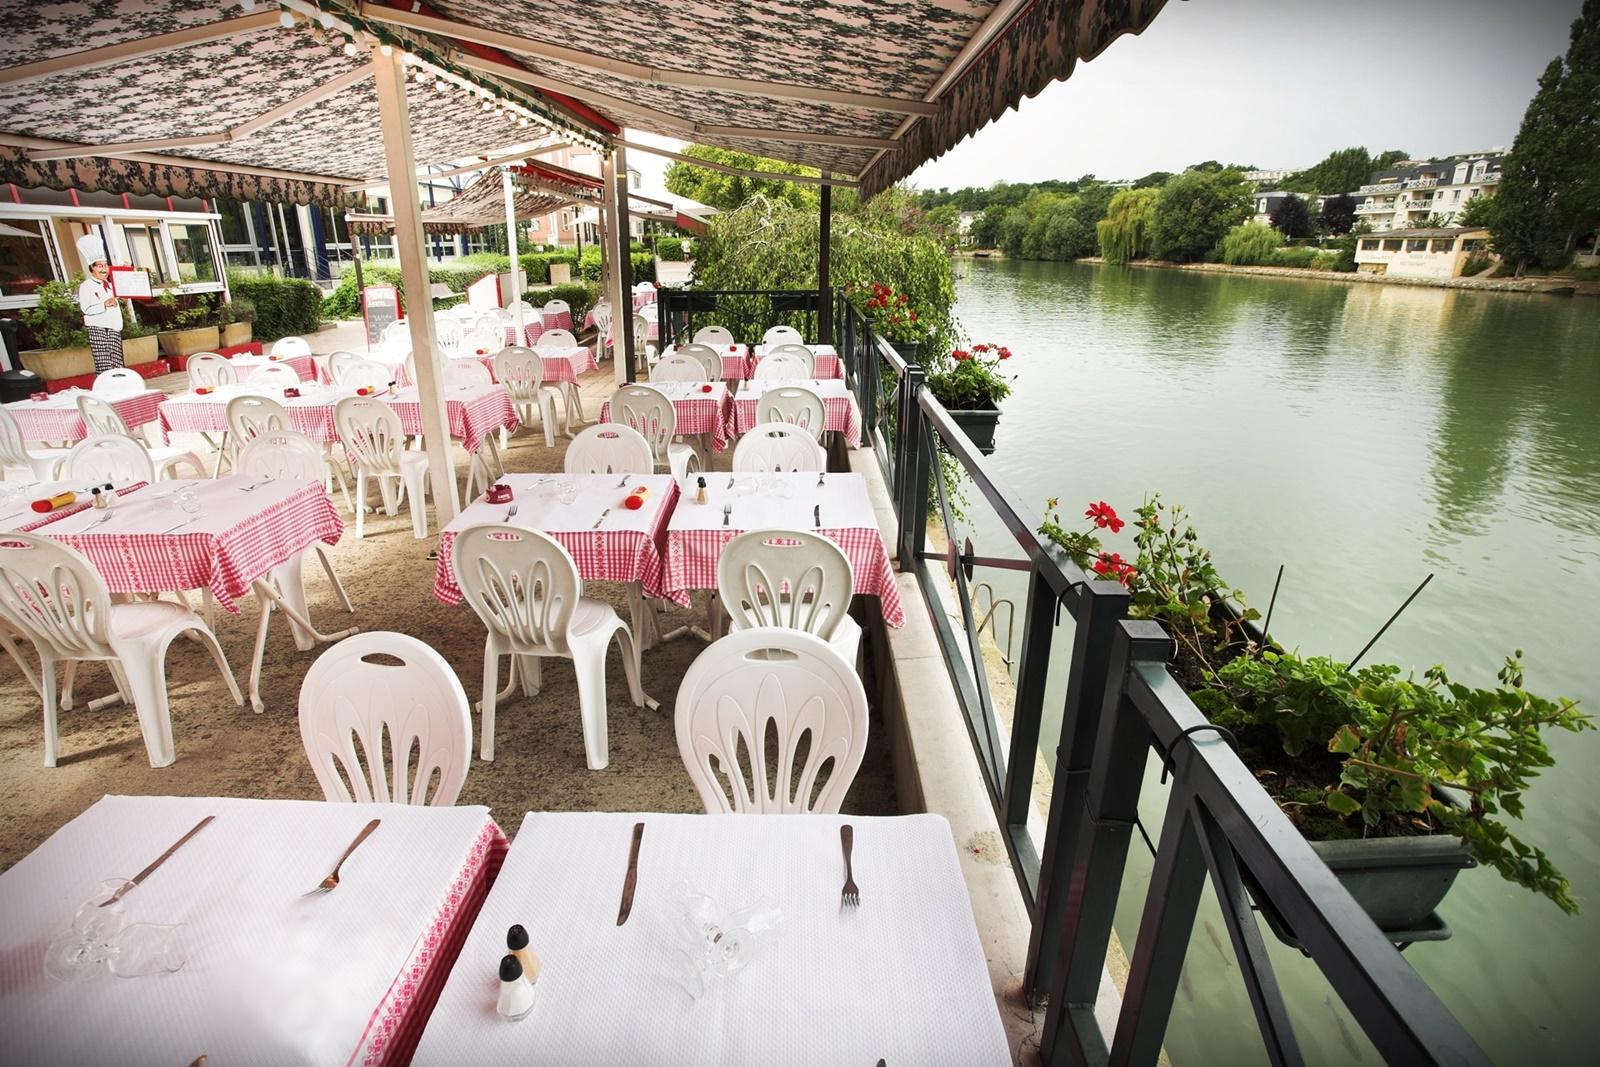 Restaurant Bord de Marne